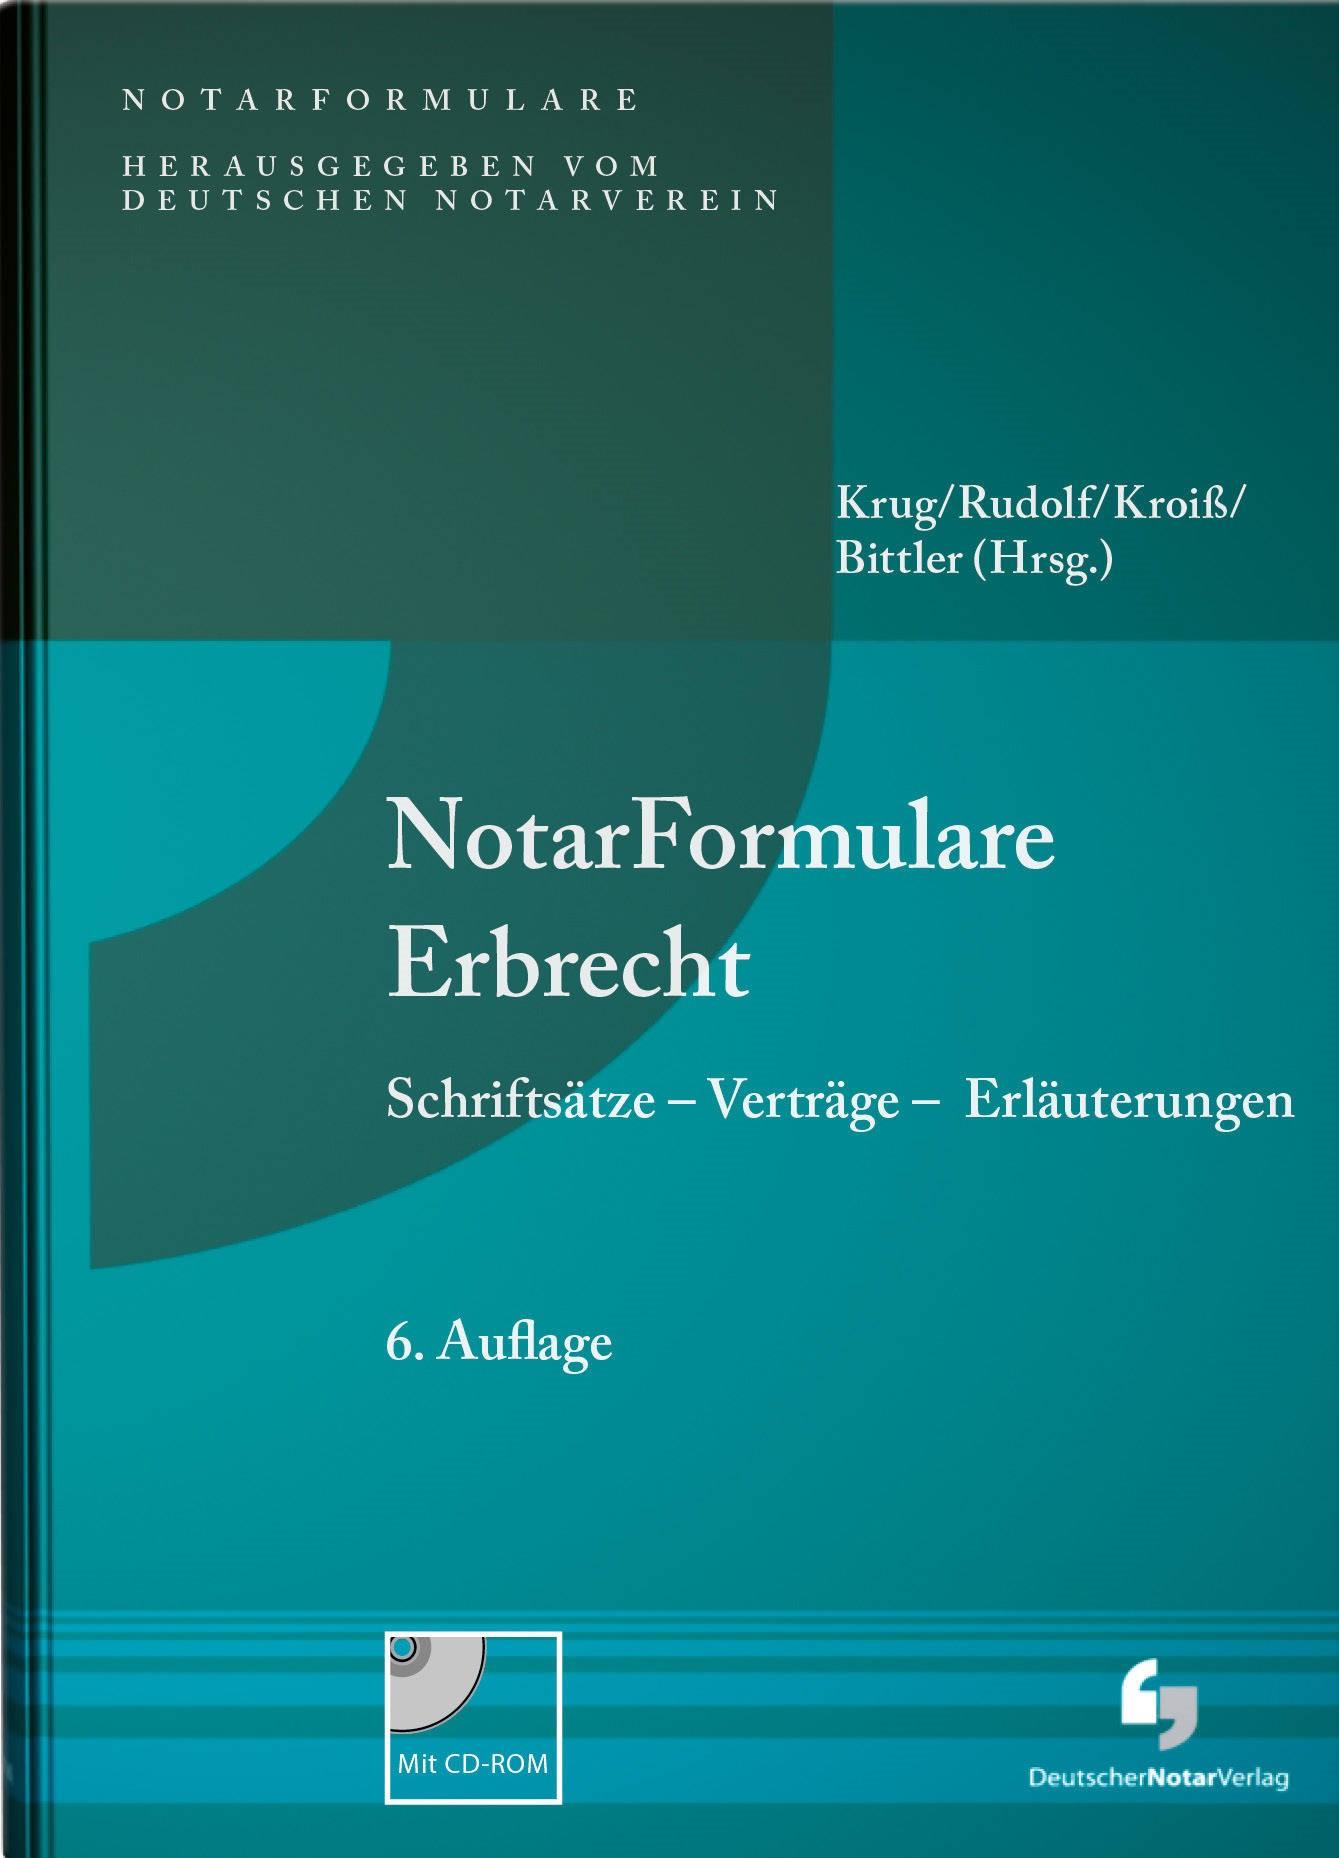 NotarFormulare Testamente | Krug / Rudolf / Kroiß / Bittler (Hrsg.) | 6. Auflage, 2018 (Cover)